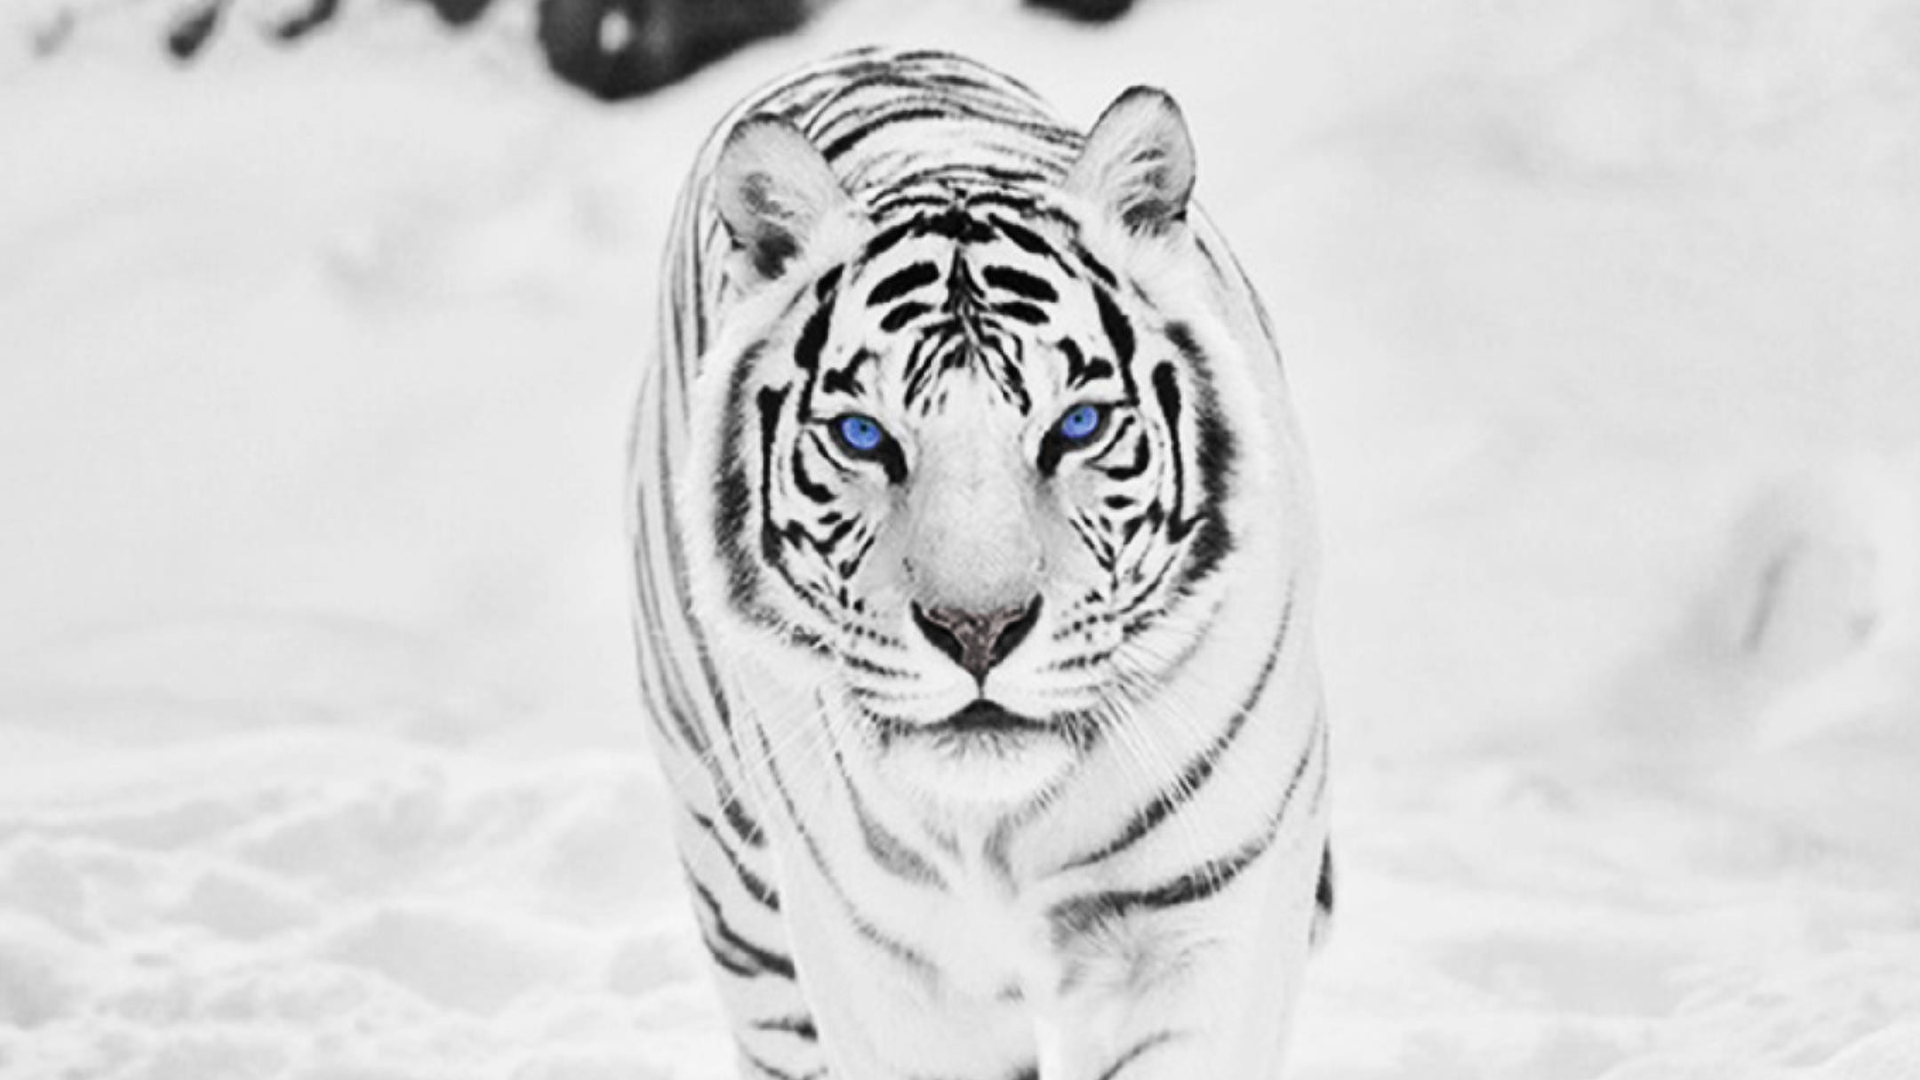 Siberian White Tiger Nexus 5 Wallpaper 1920x1080 1920x1080